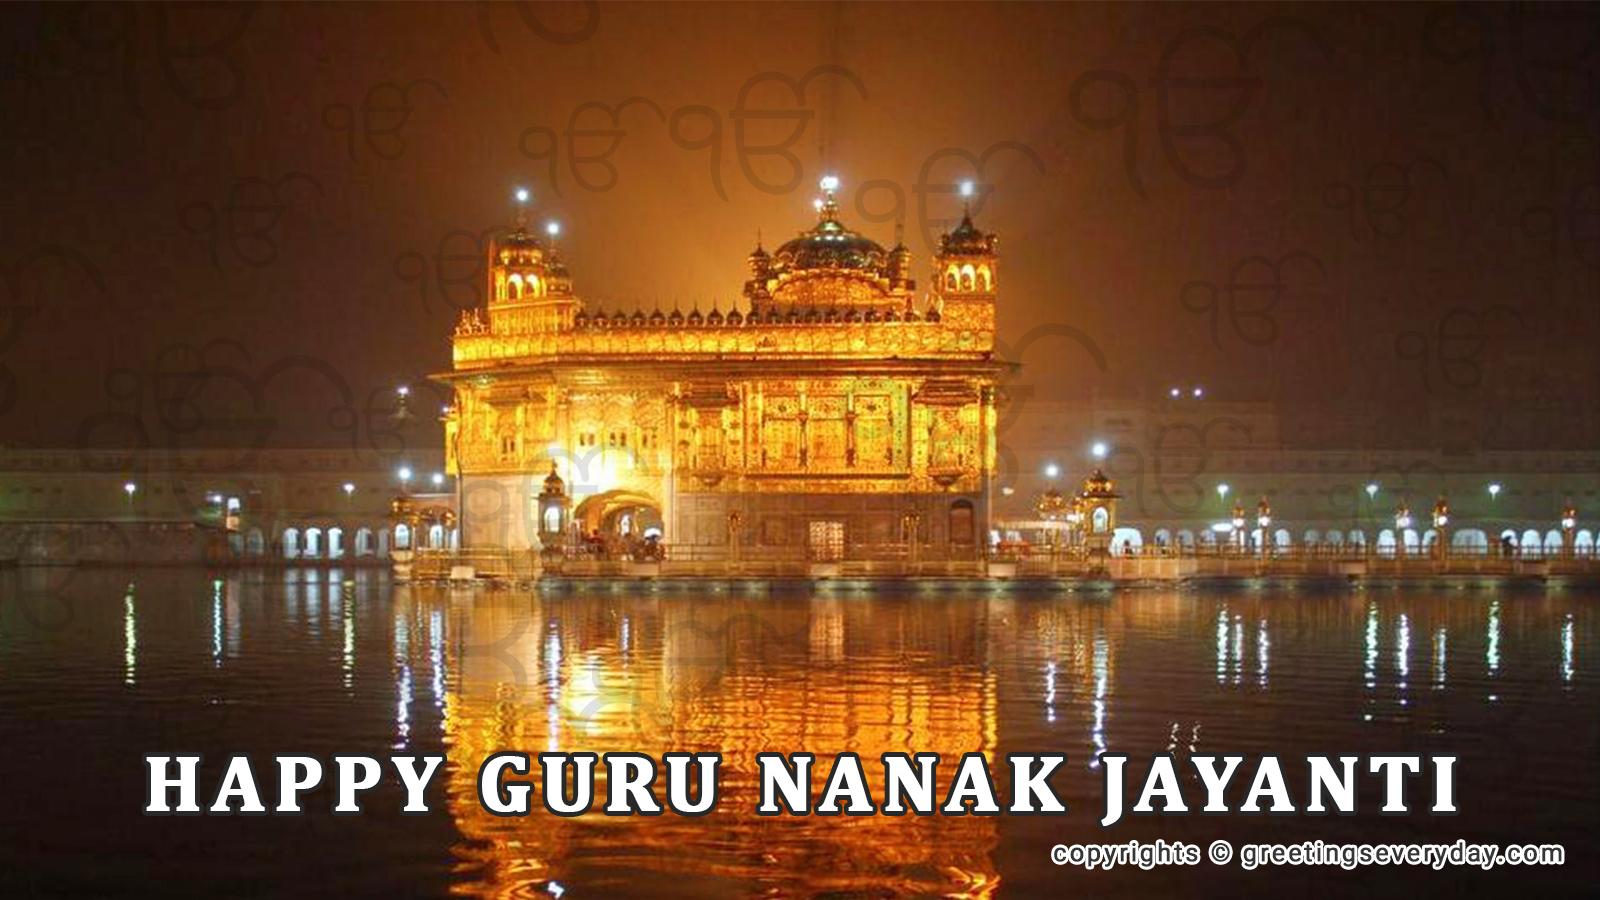 Guru Nanak Jayanti Photos For Facebook